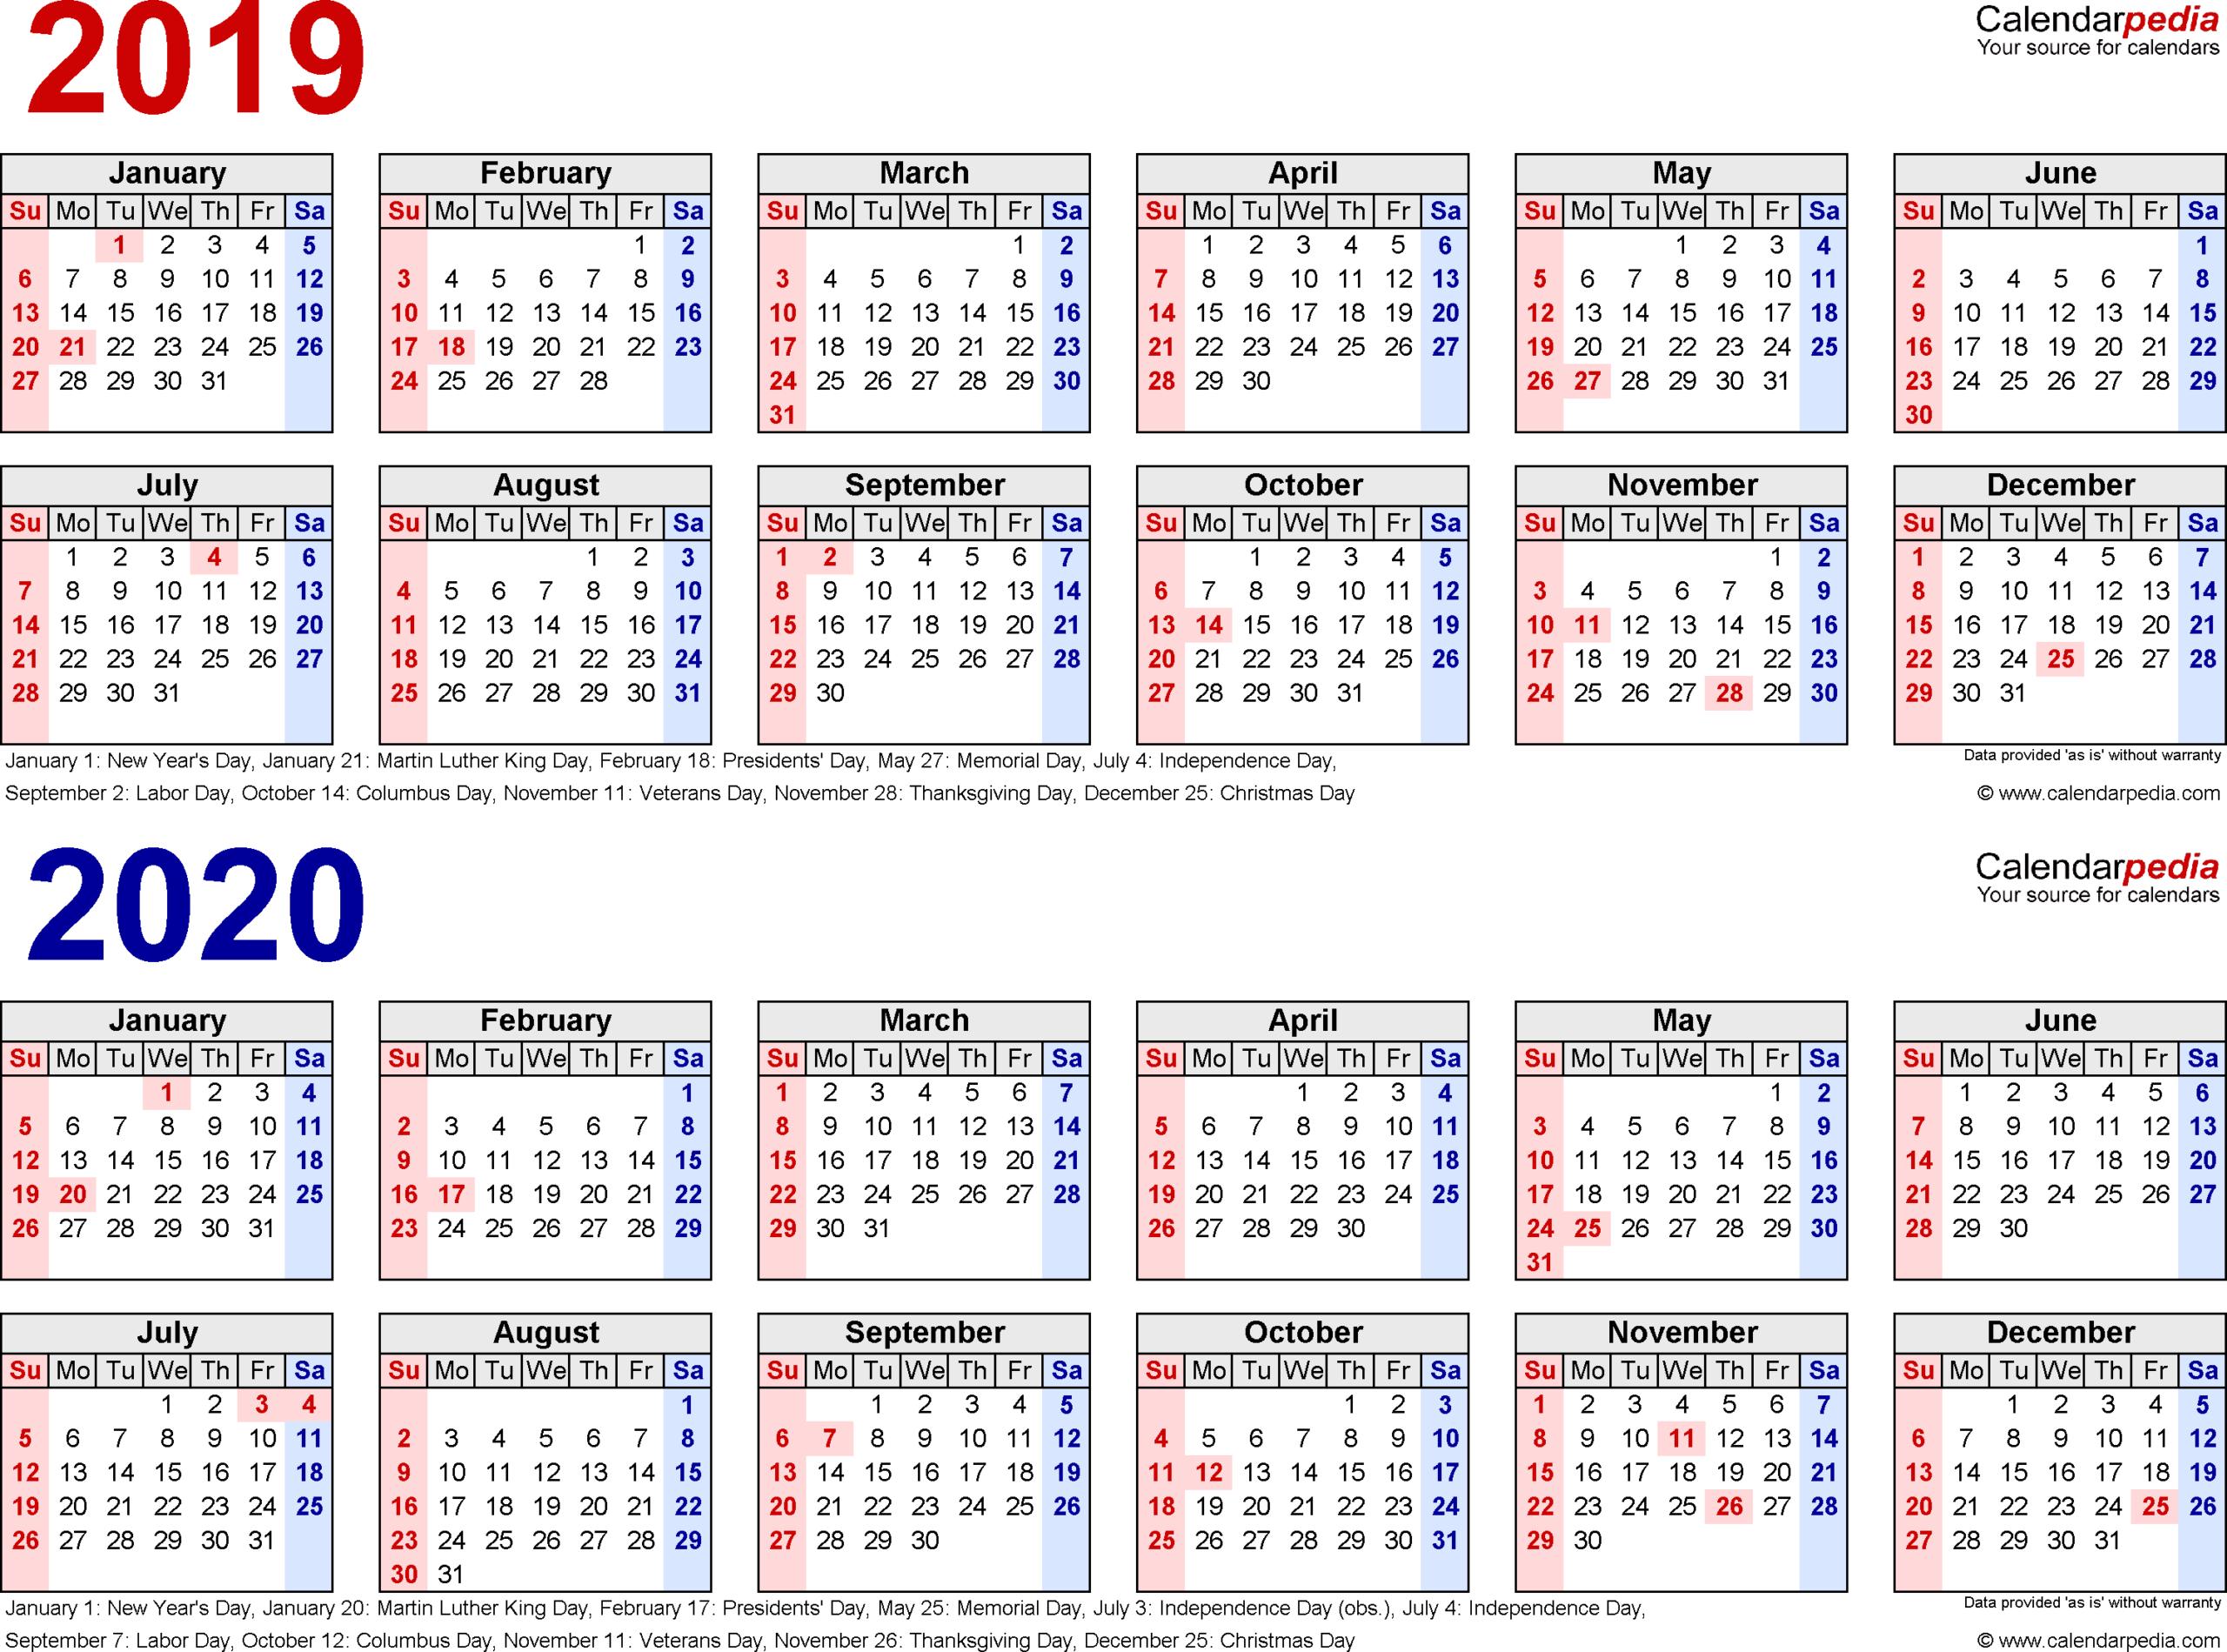 2020 Calendar Canada Printable With Holidays | Calendar